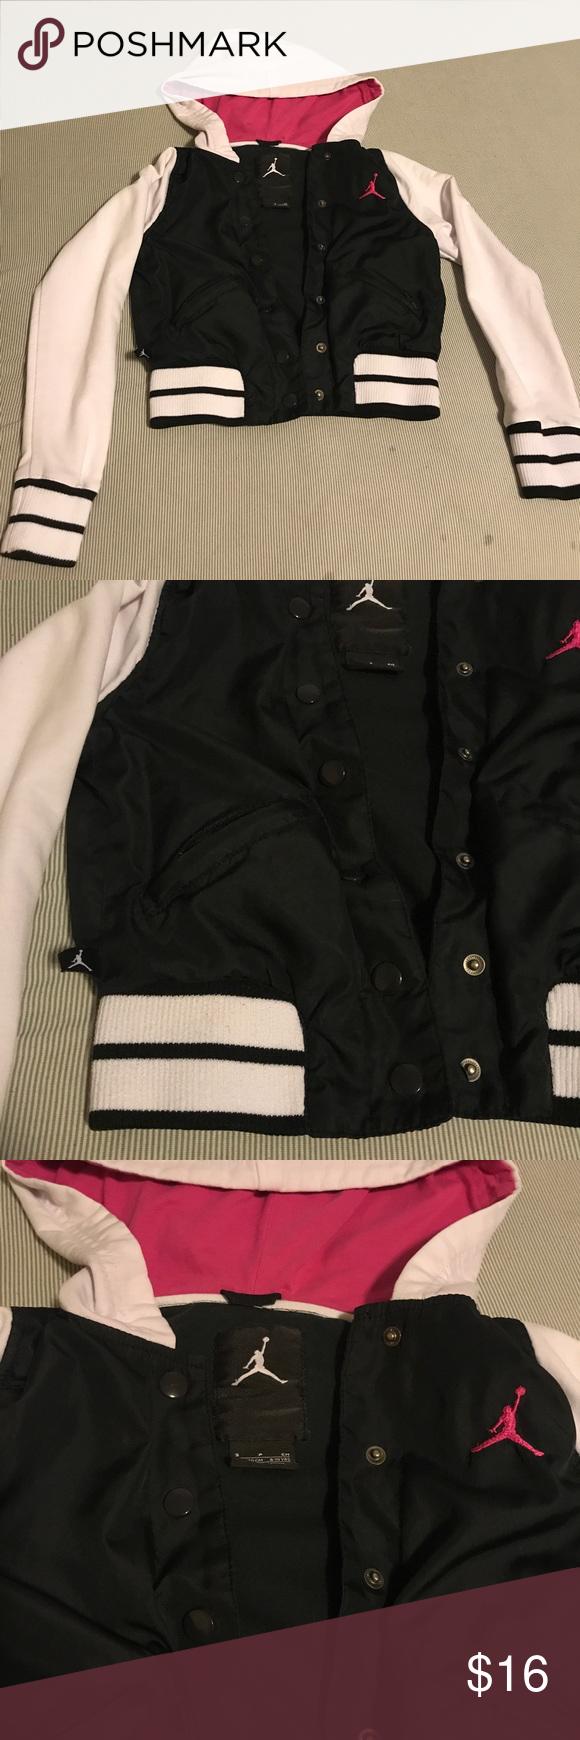 6448293d7cbba8 Girls White black pink Jordan Hoodie Jordan Hoodie Button up Varsity-like  Jordan Shirts   Tops Sweatshirts   Hoodies